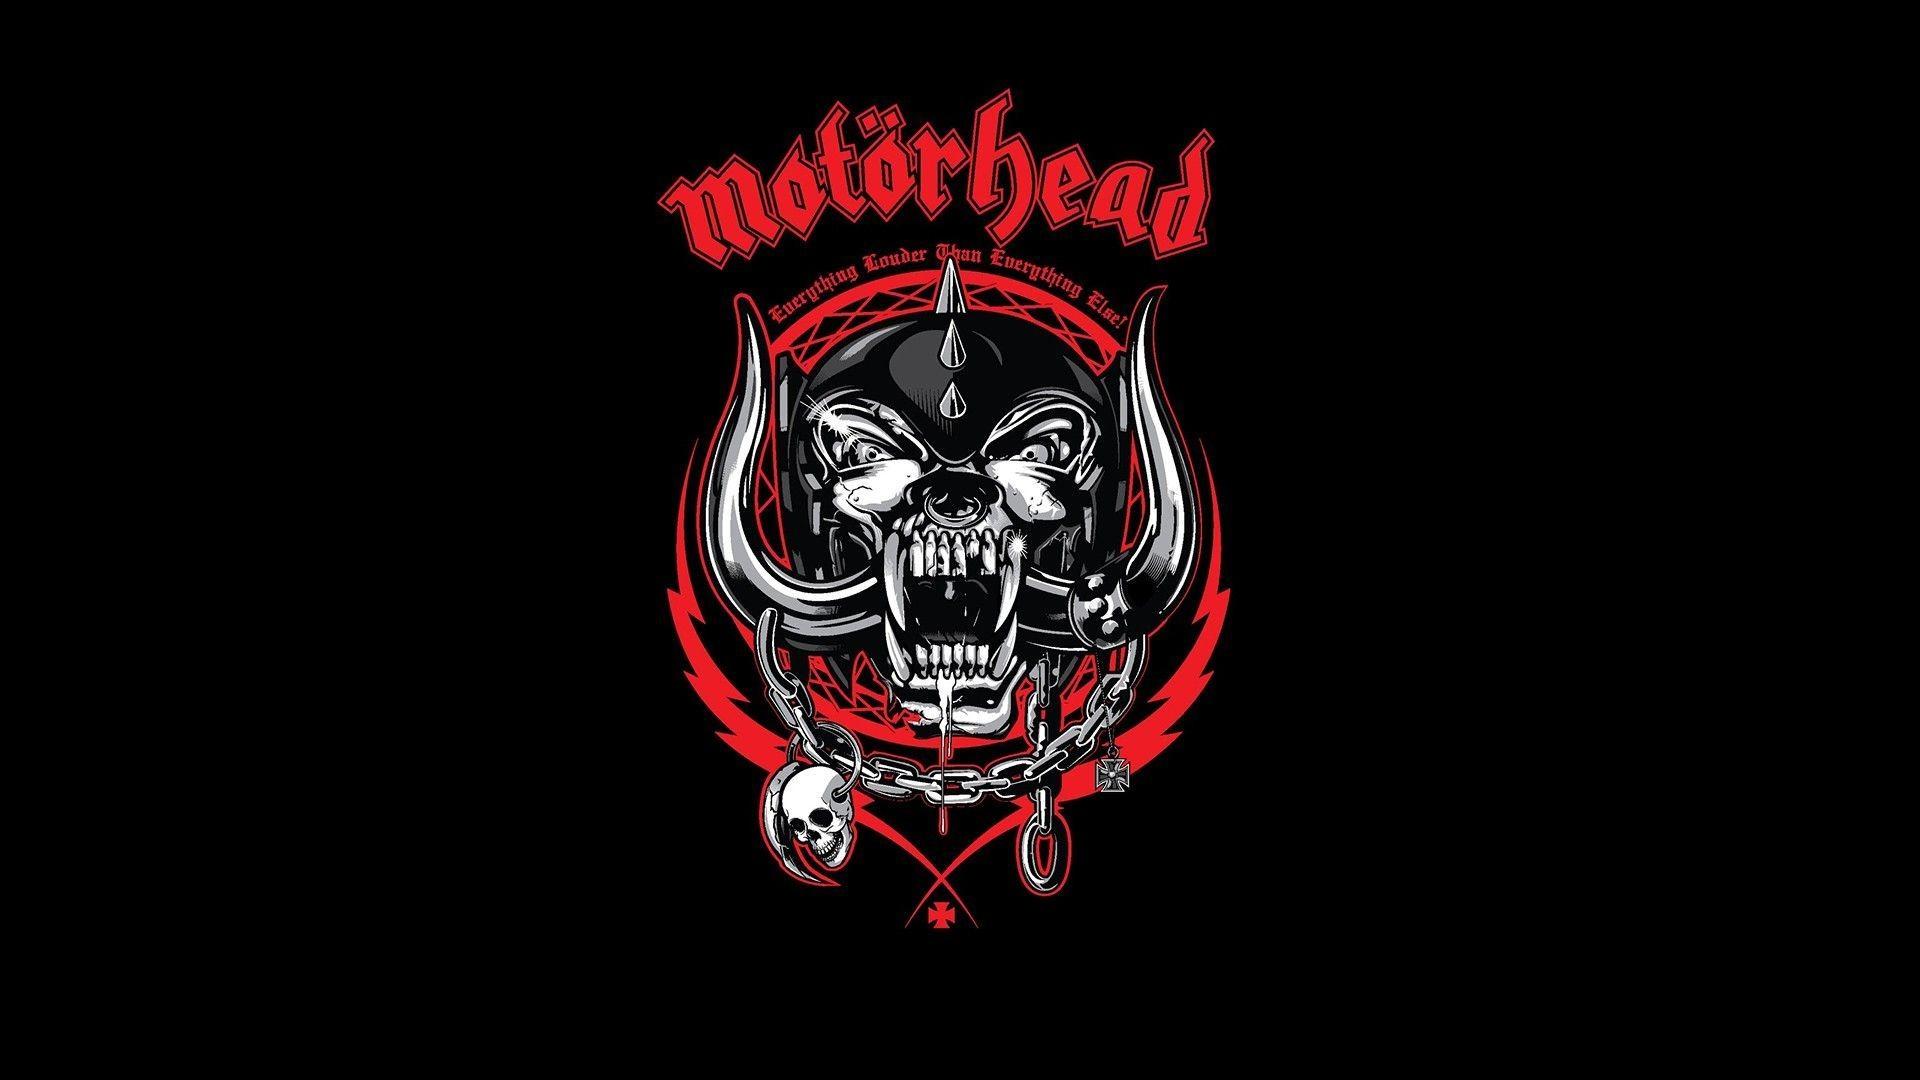 Lemmy Kilmister Rock Music Motorhead Wallpaper Hd: Band Logos Wallpaper HD ·①